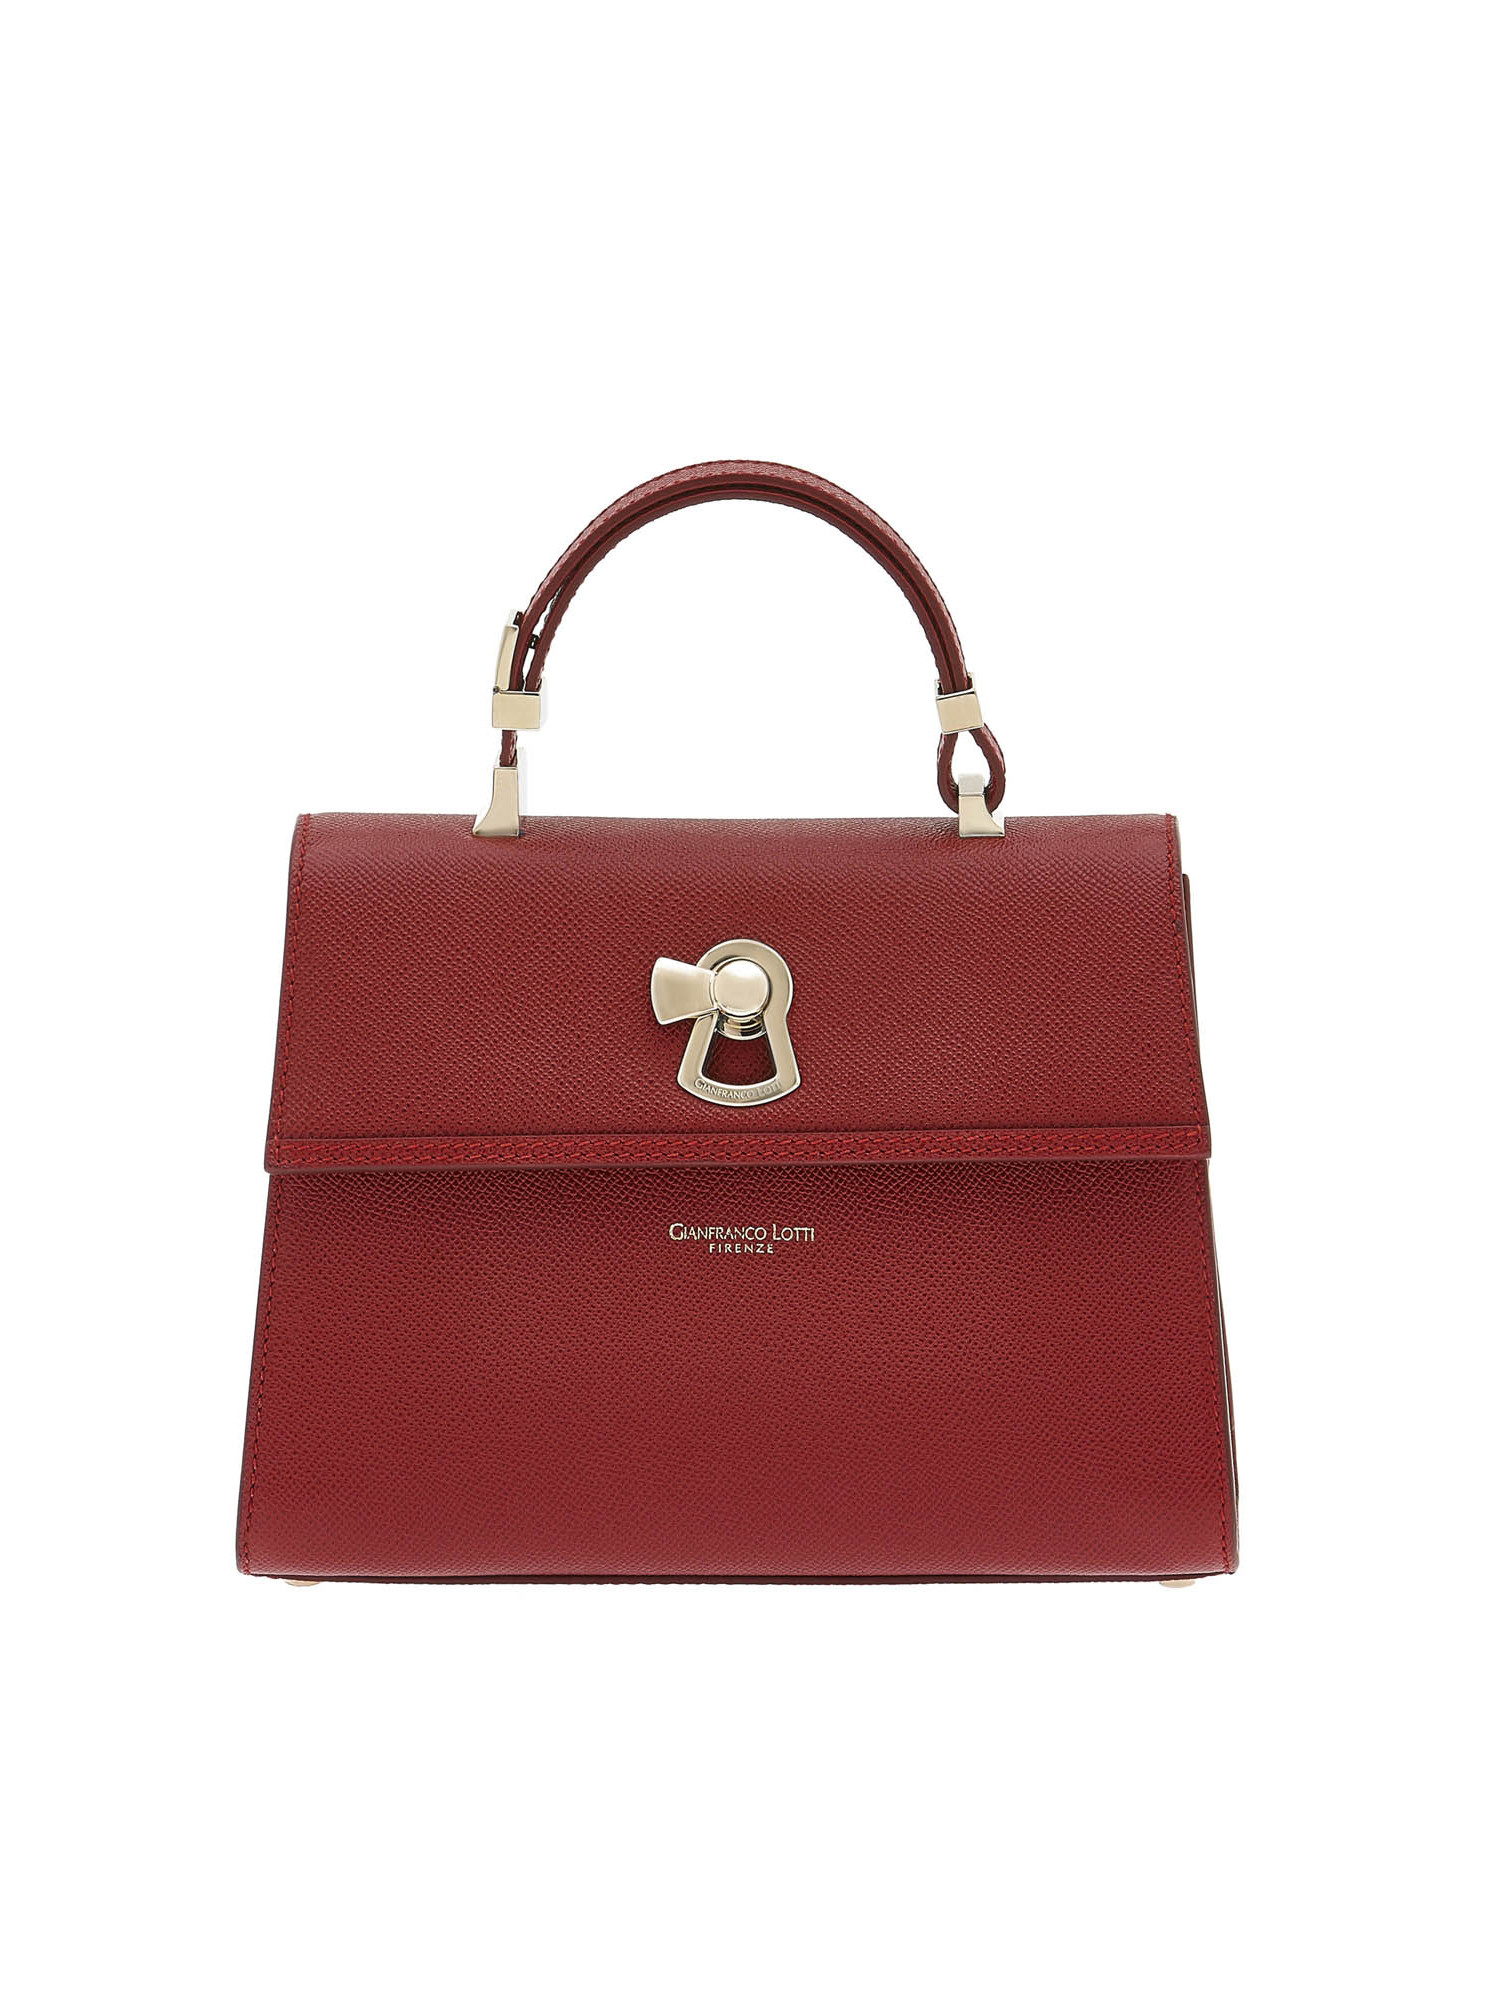 Gianfranco Lotti Luxury bags in Florence since 1968